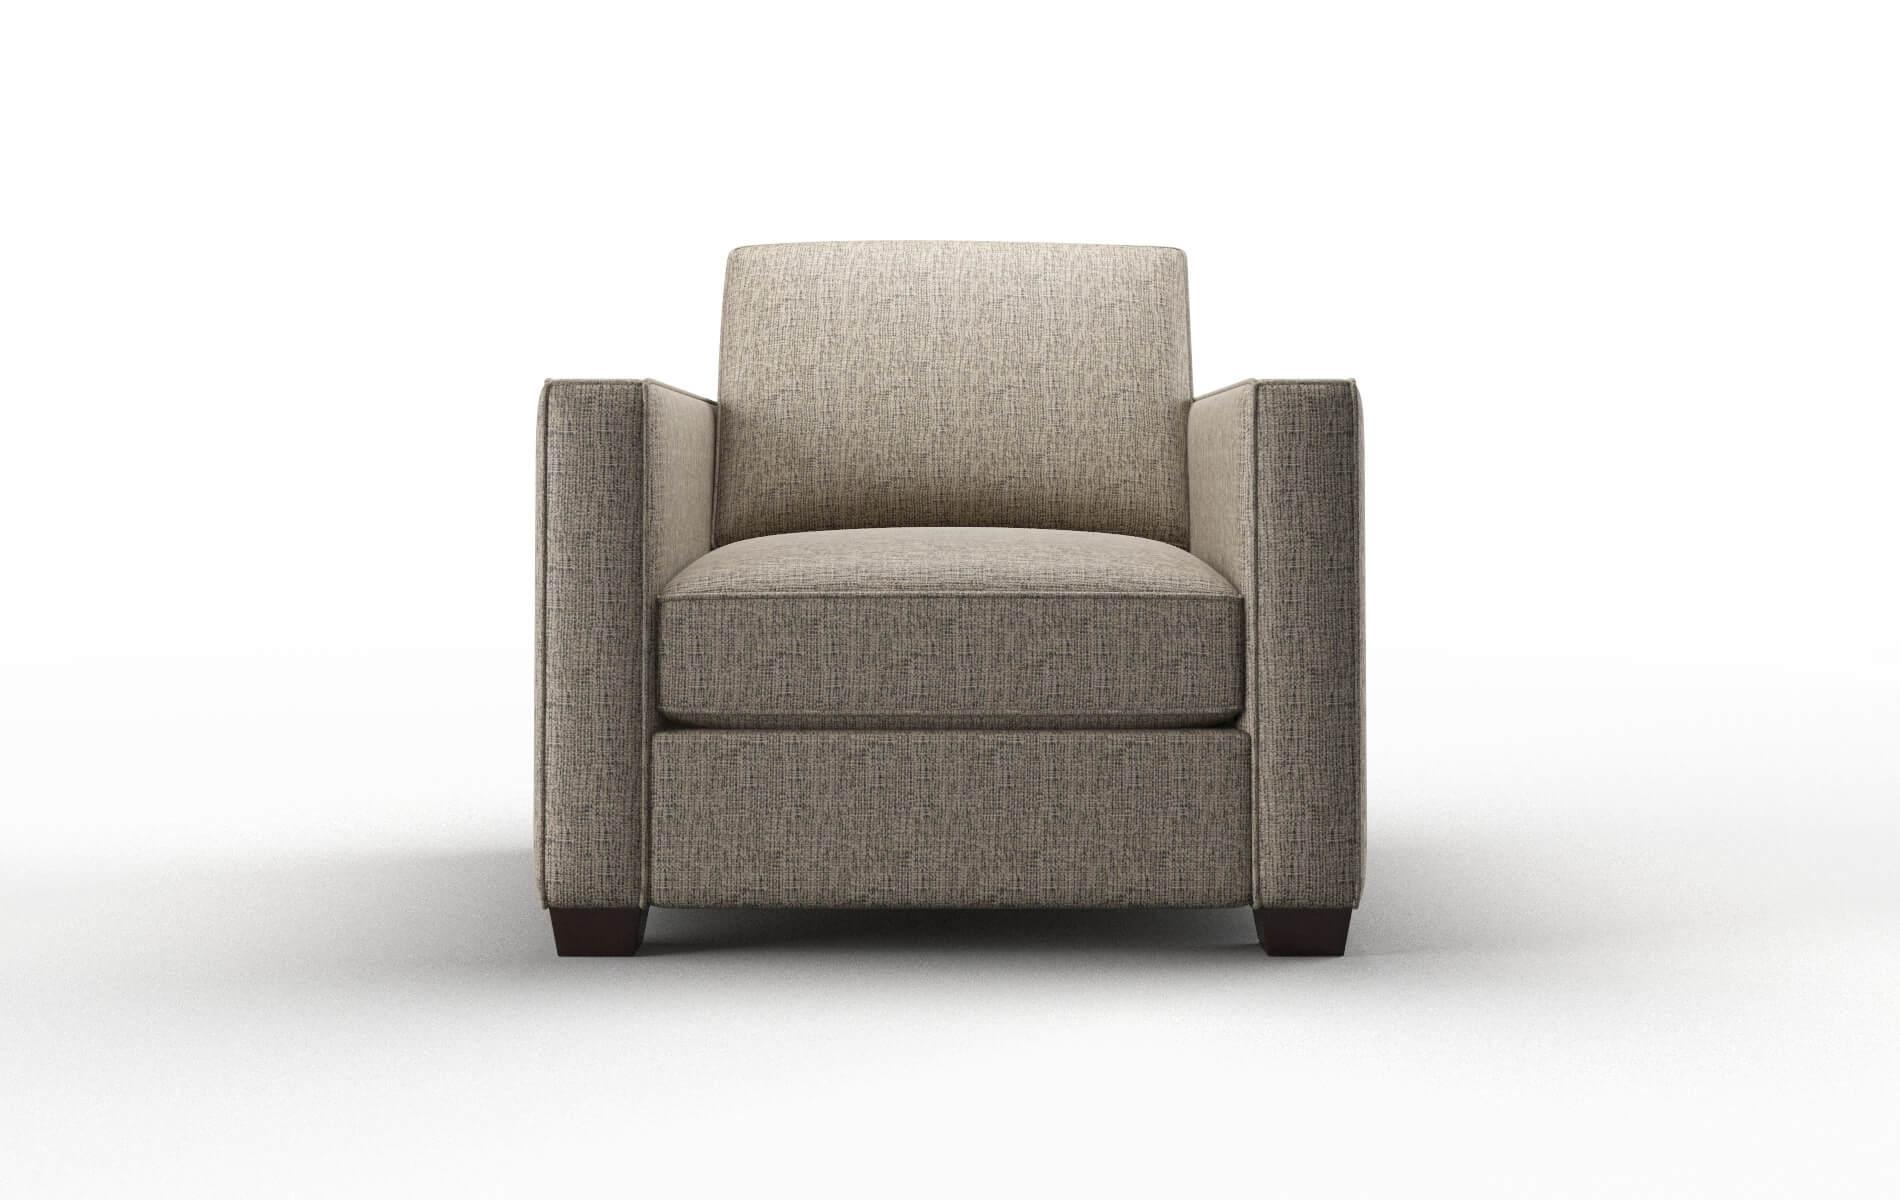 Calgary Solifestyle 51 Chair espresso legs 1